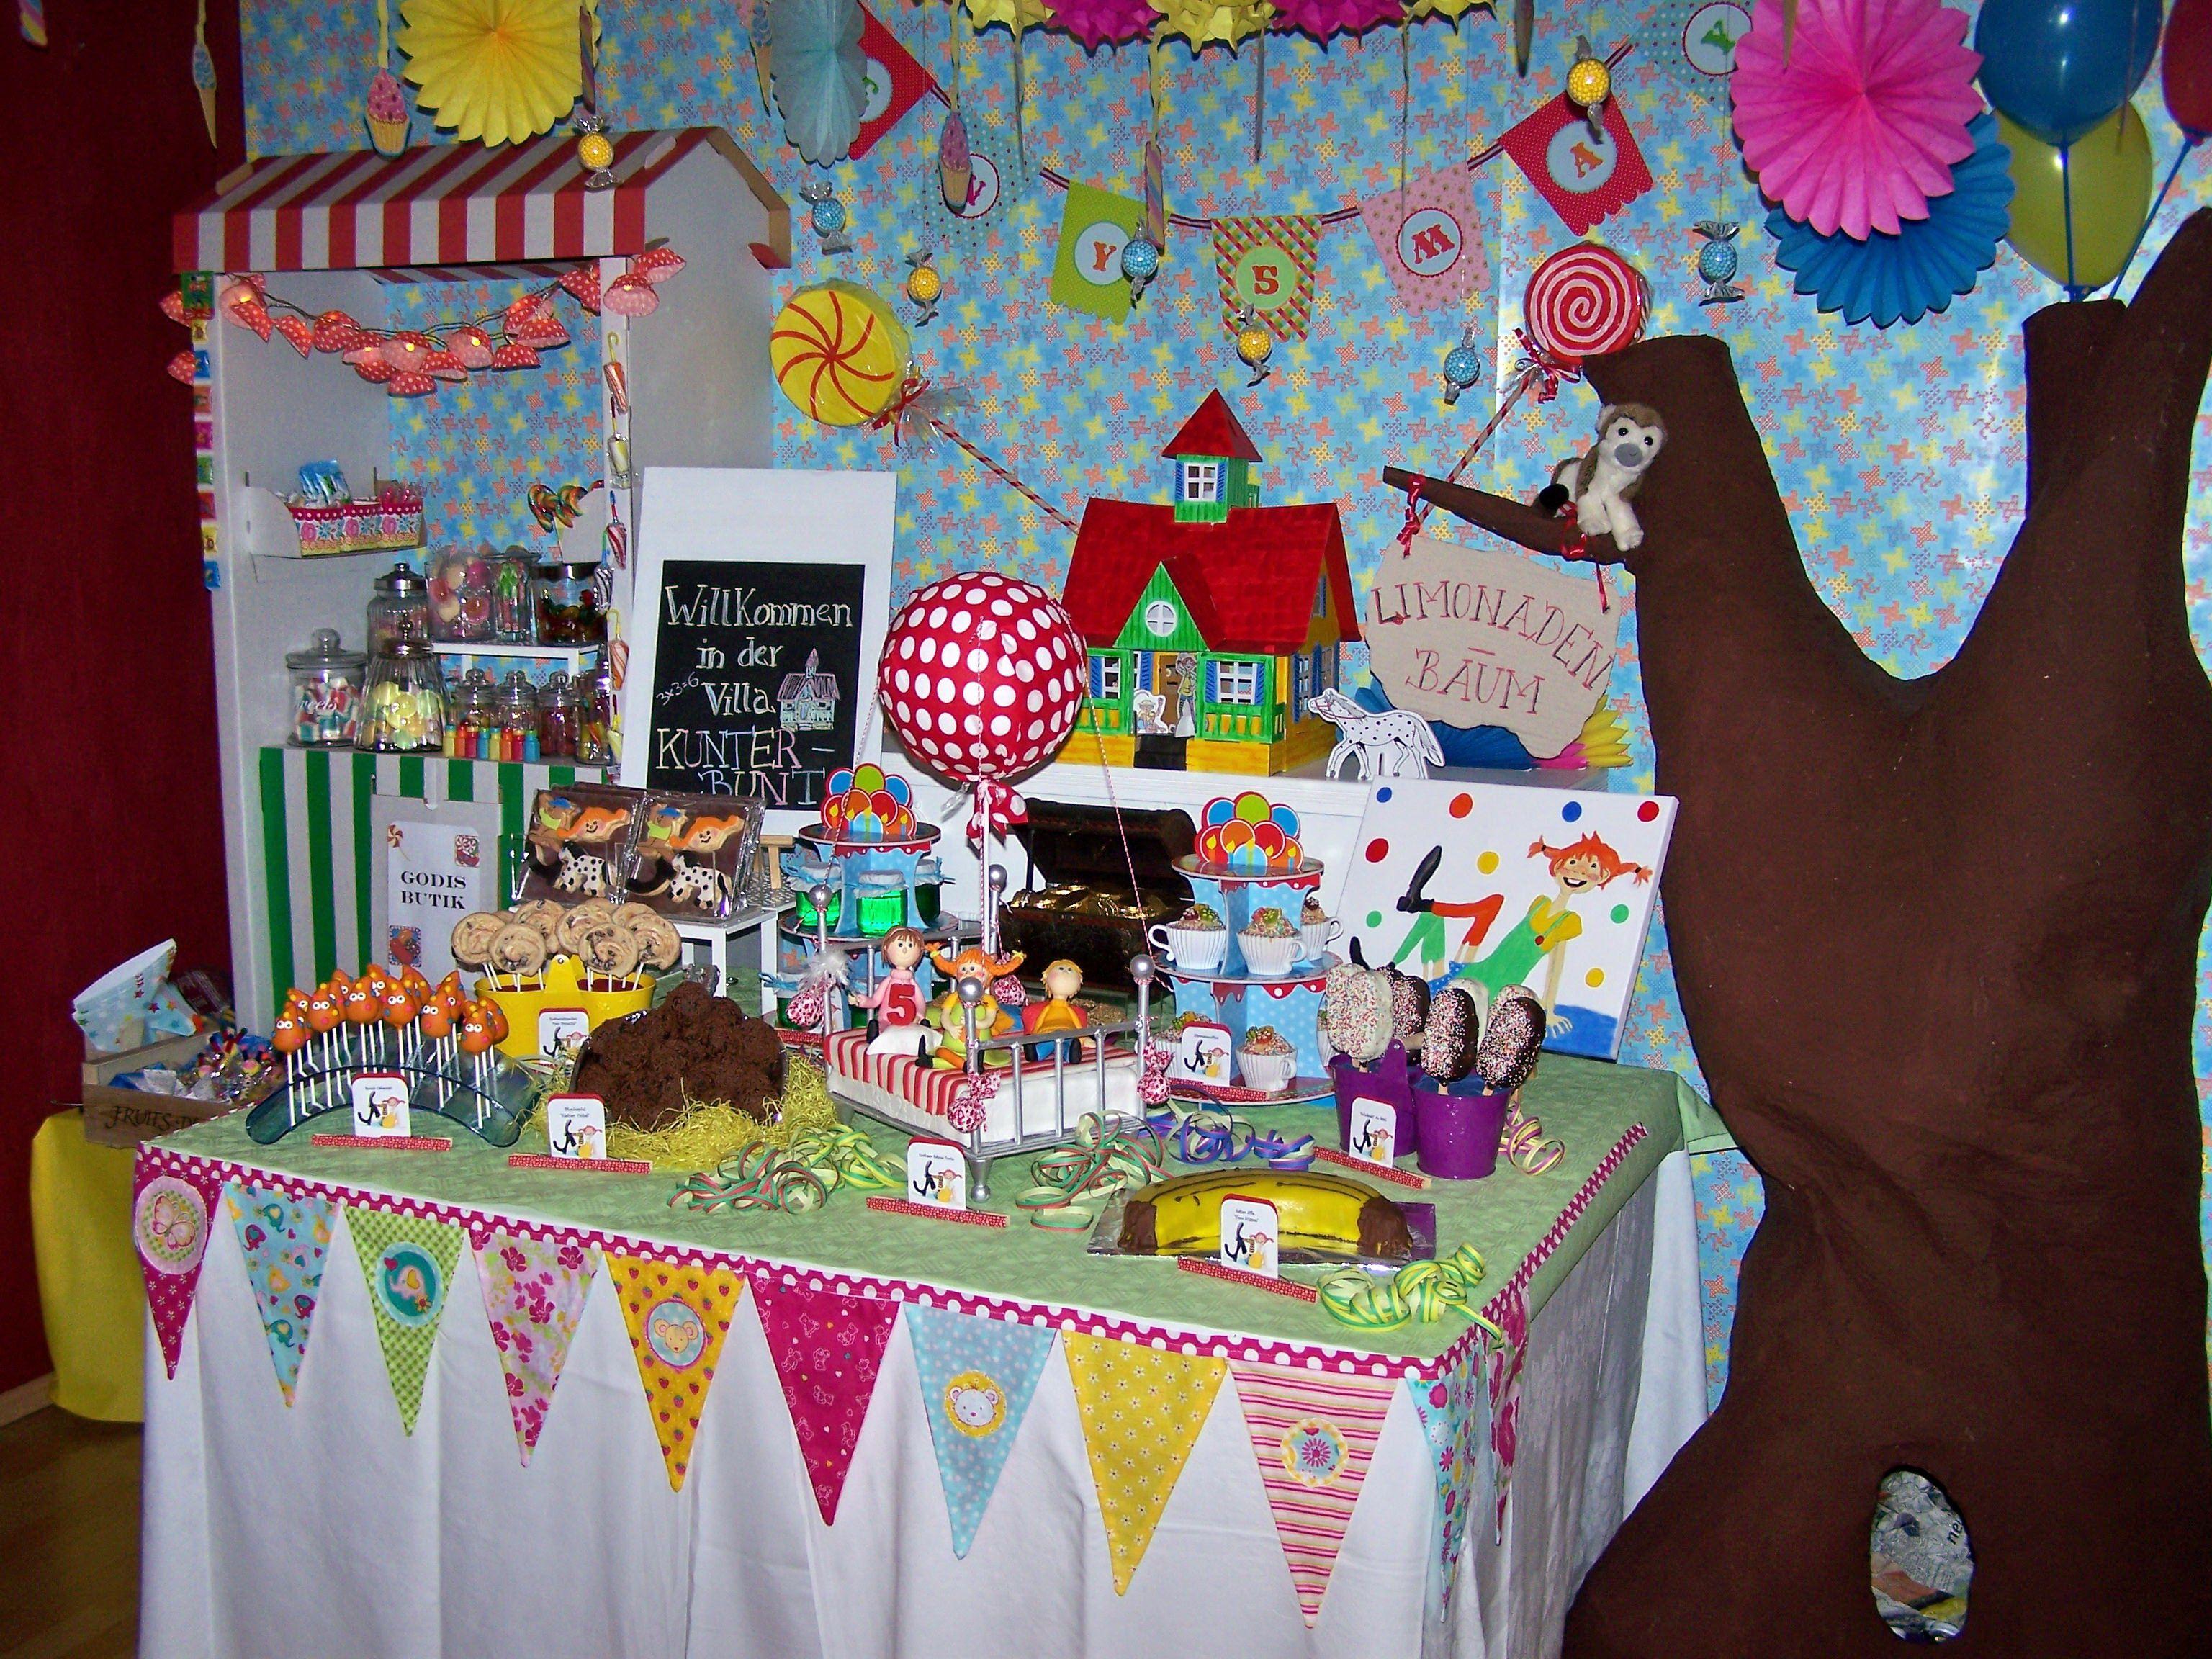 pippi langstrumpf party zum 5. geburtstag leny | pippi langstrumpf, Einladung